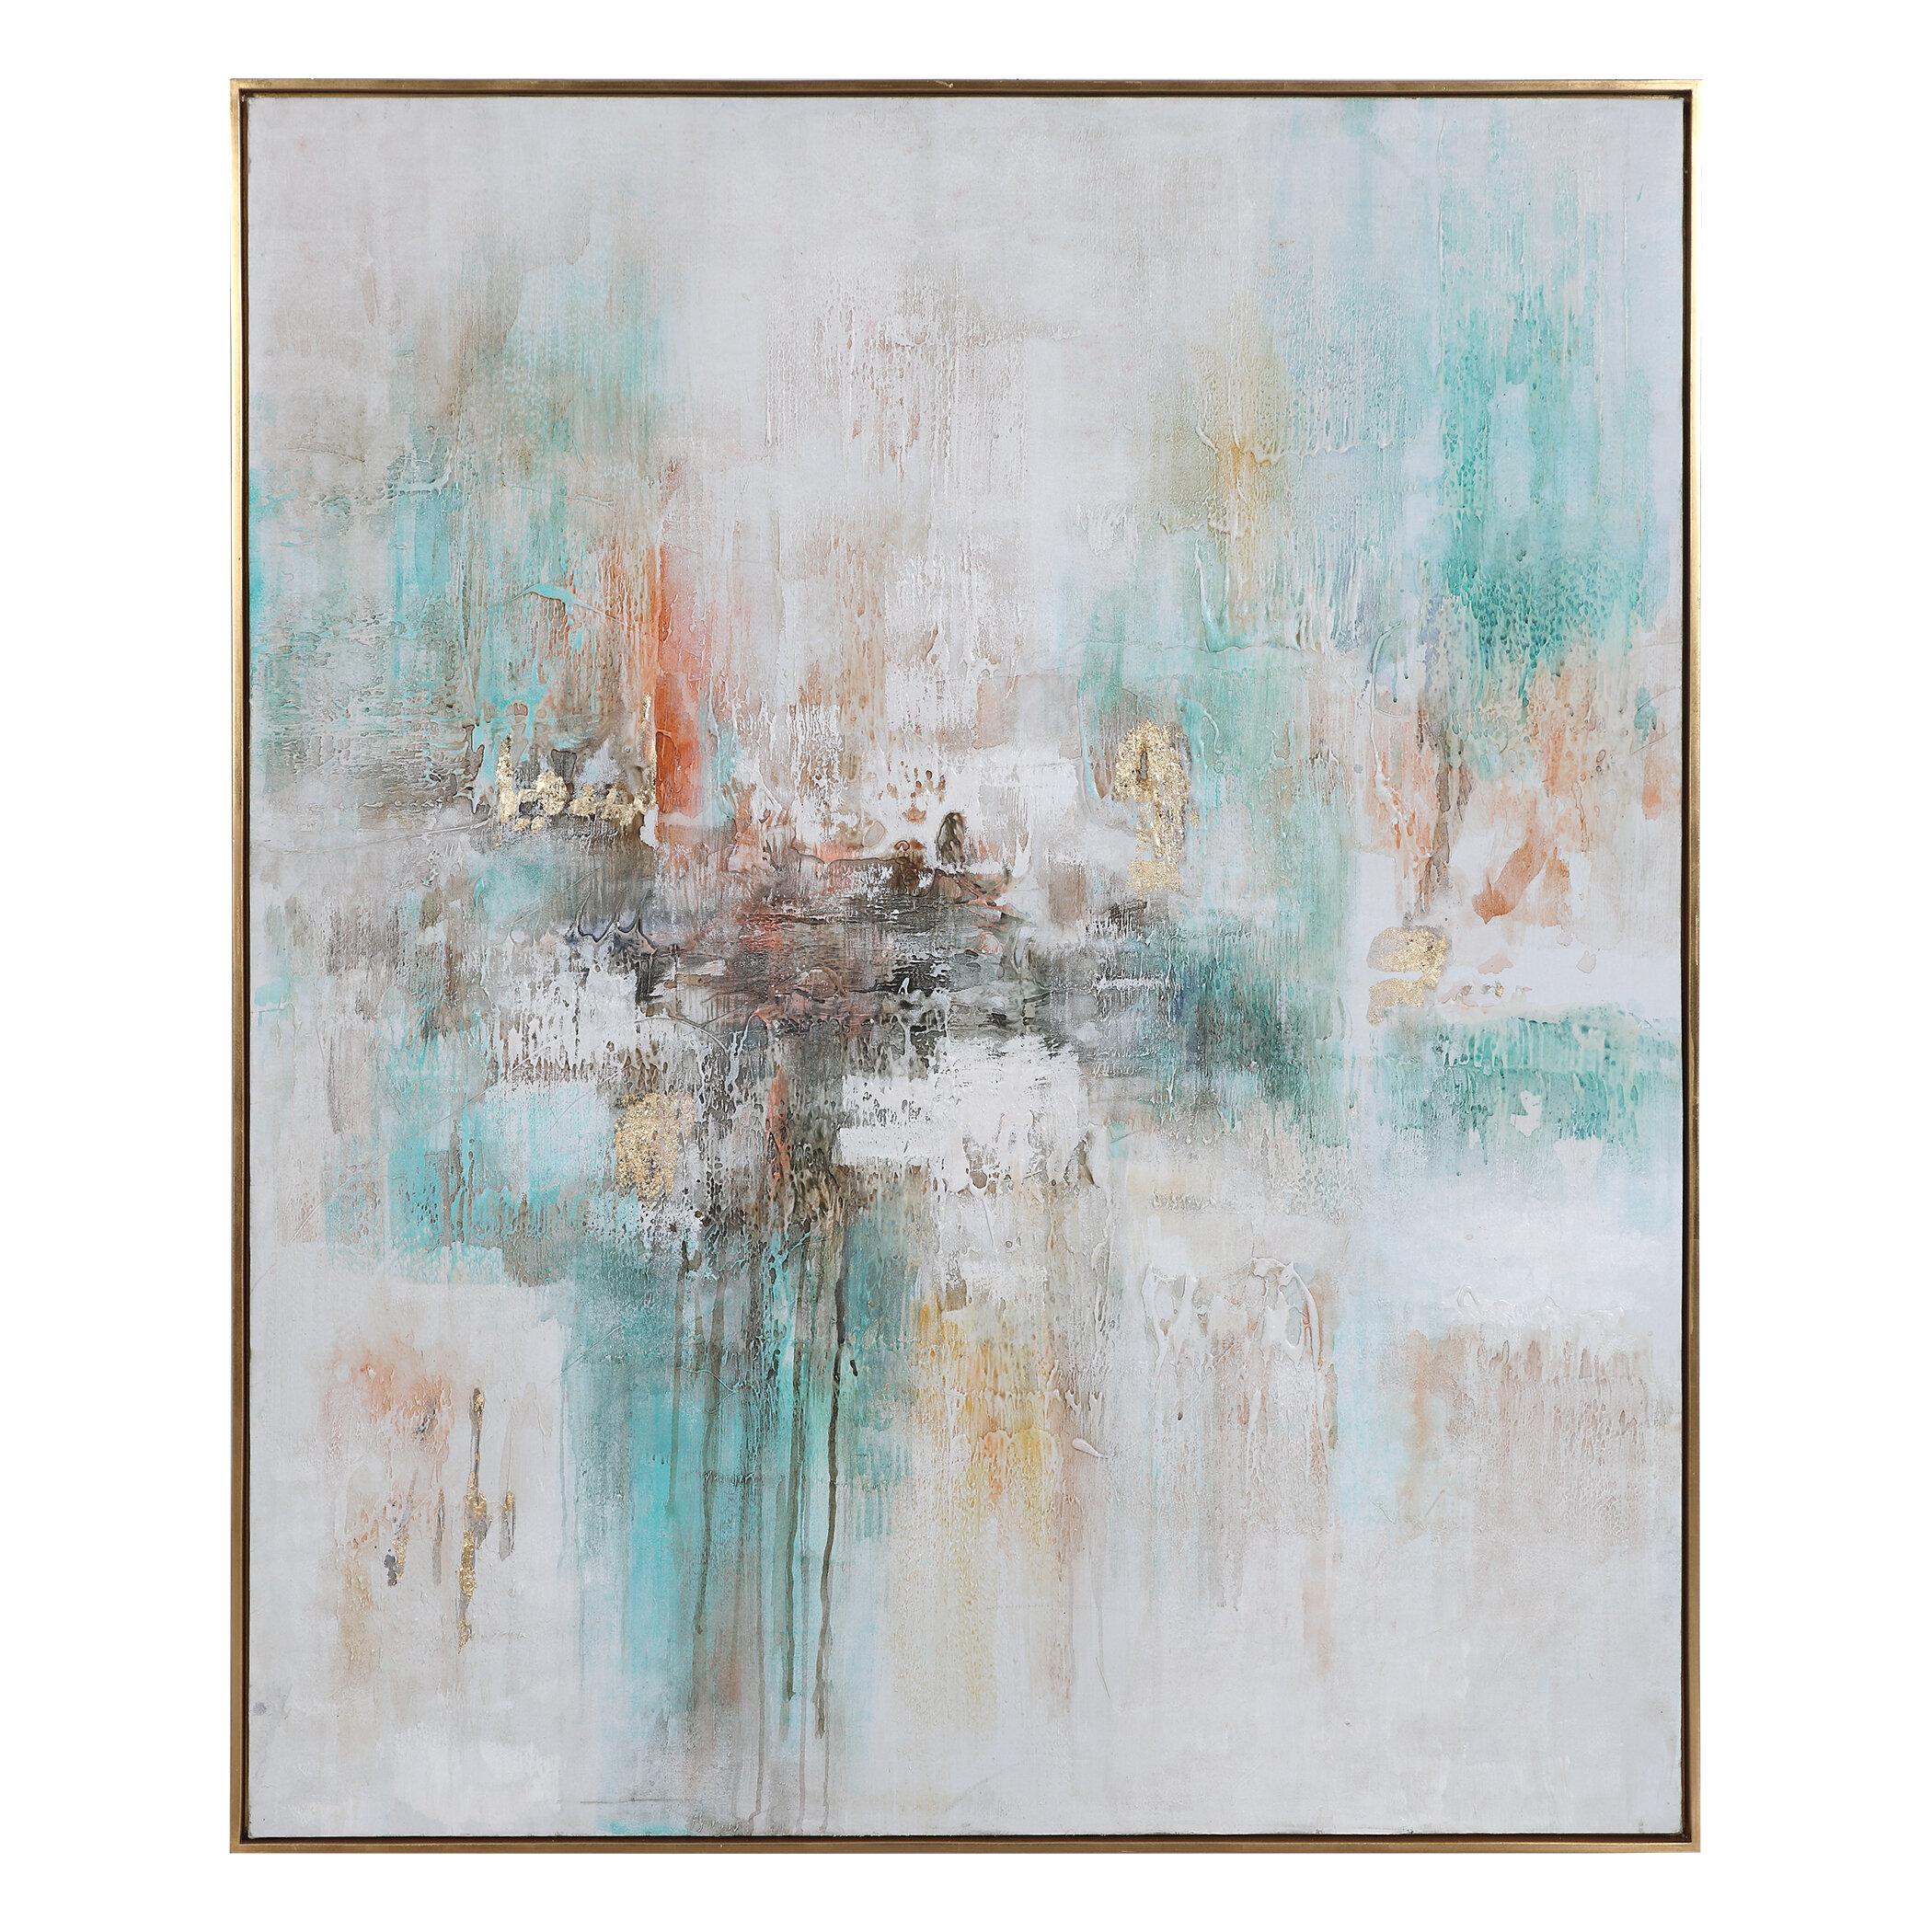 Brayden Studio Floater Frame Painting Print On Canvas Wayfair